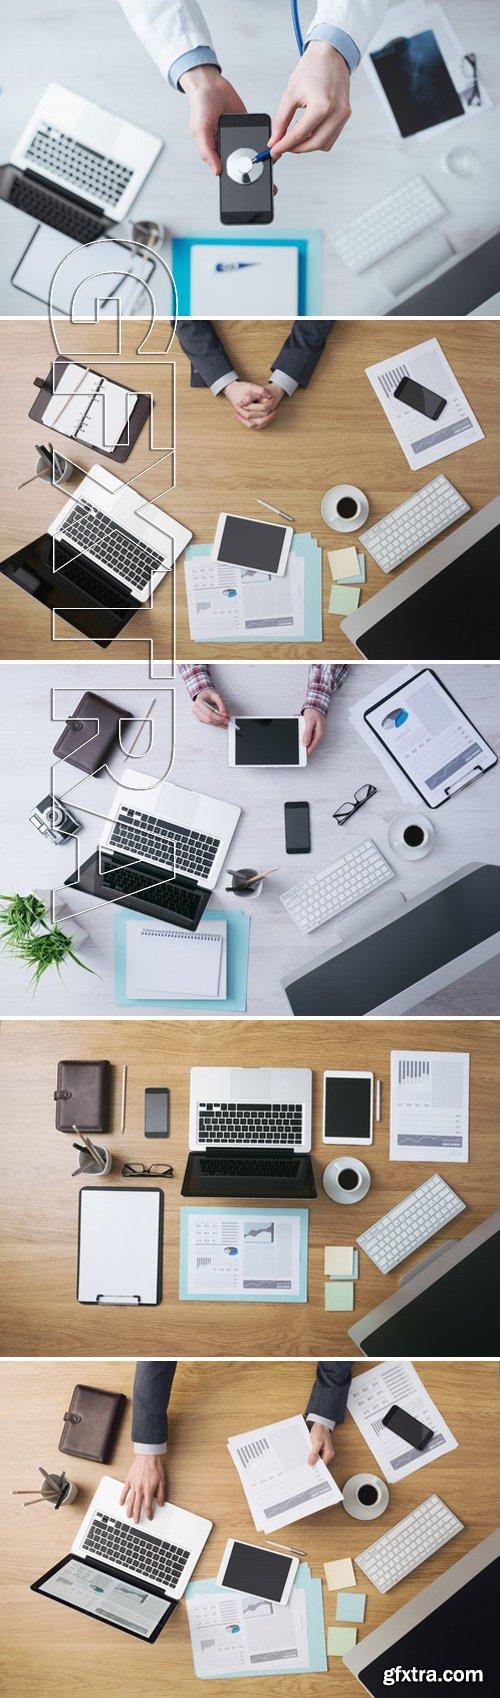 Stock Photos - Workplace Businessman